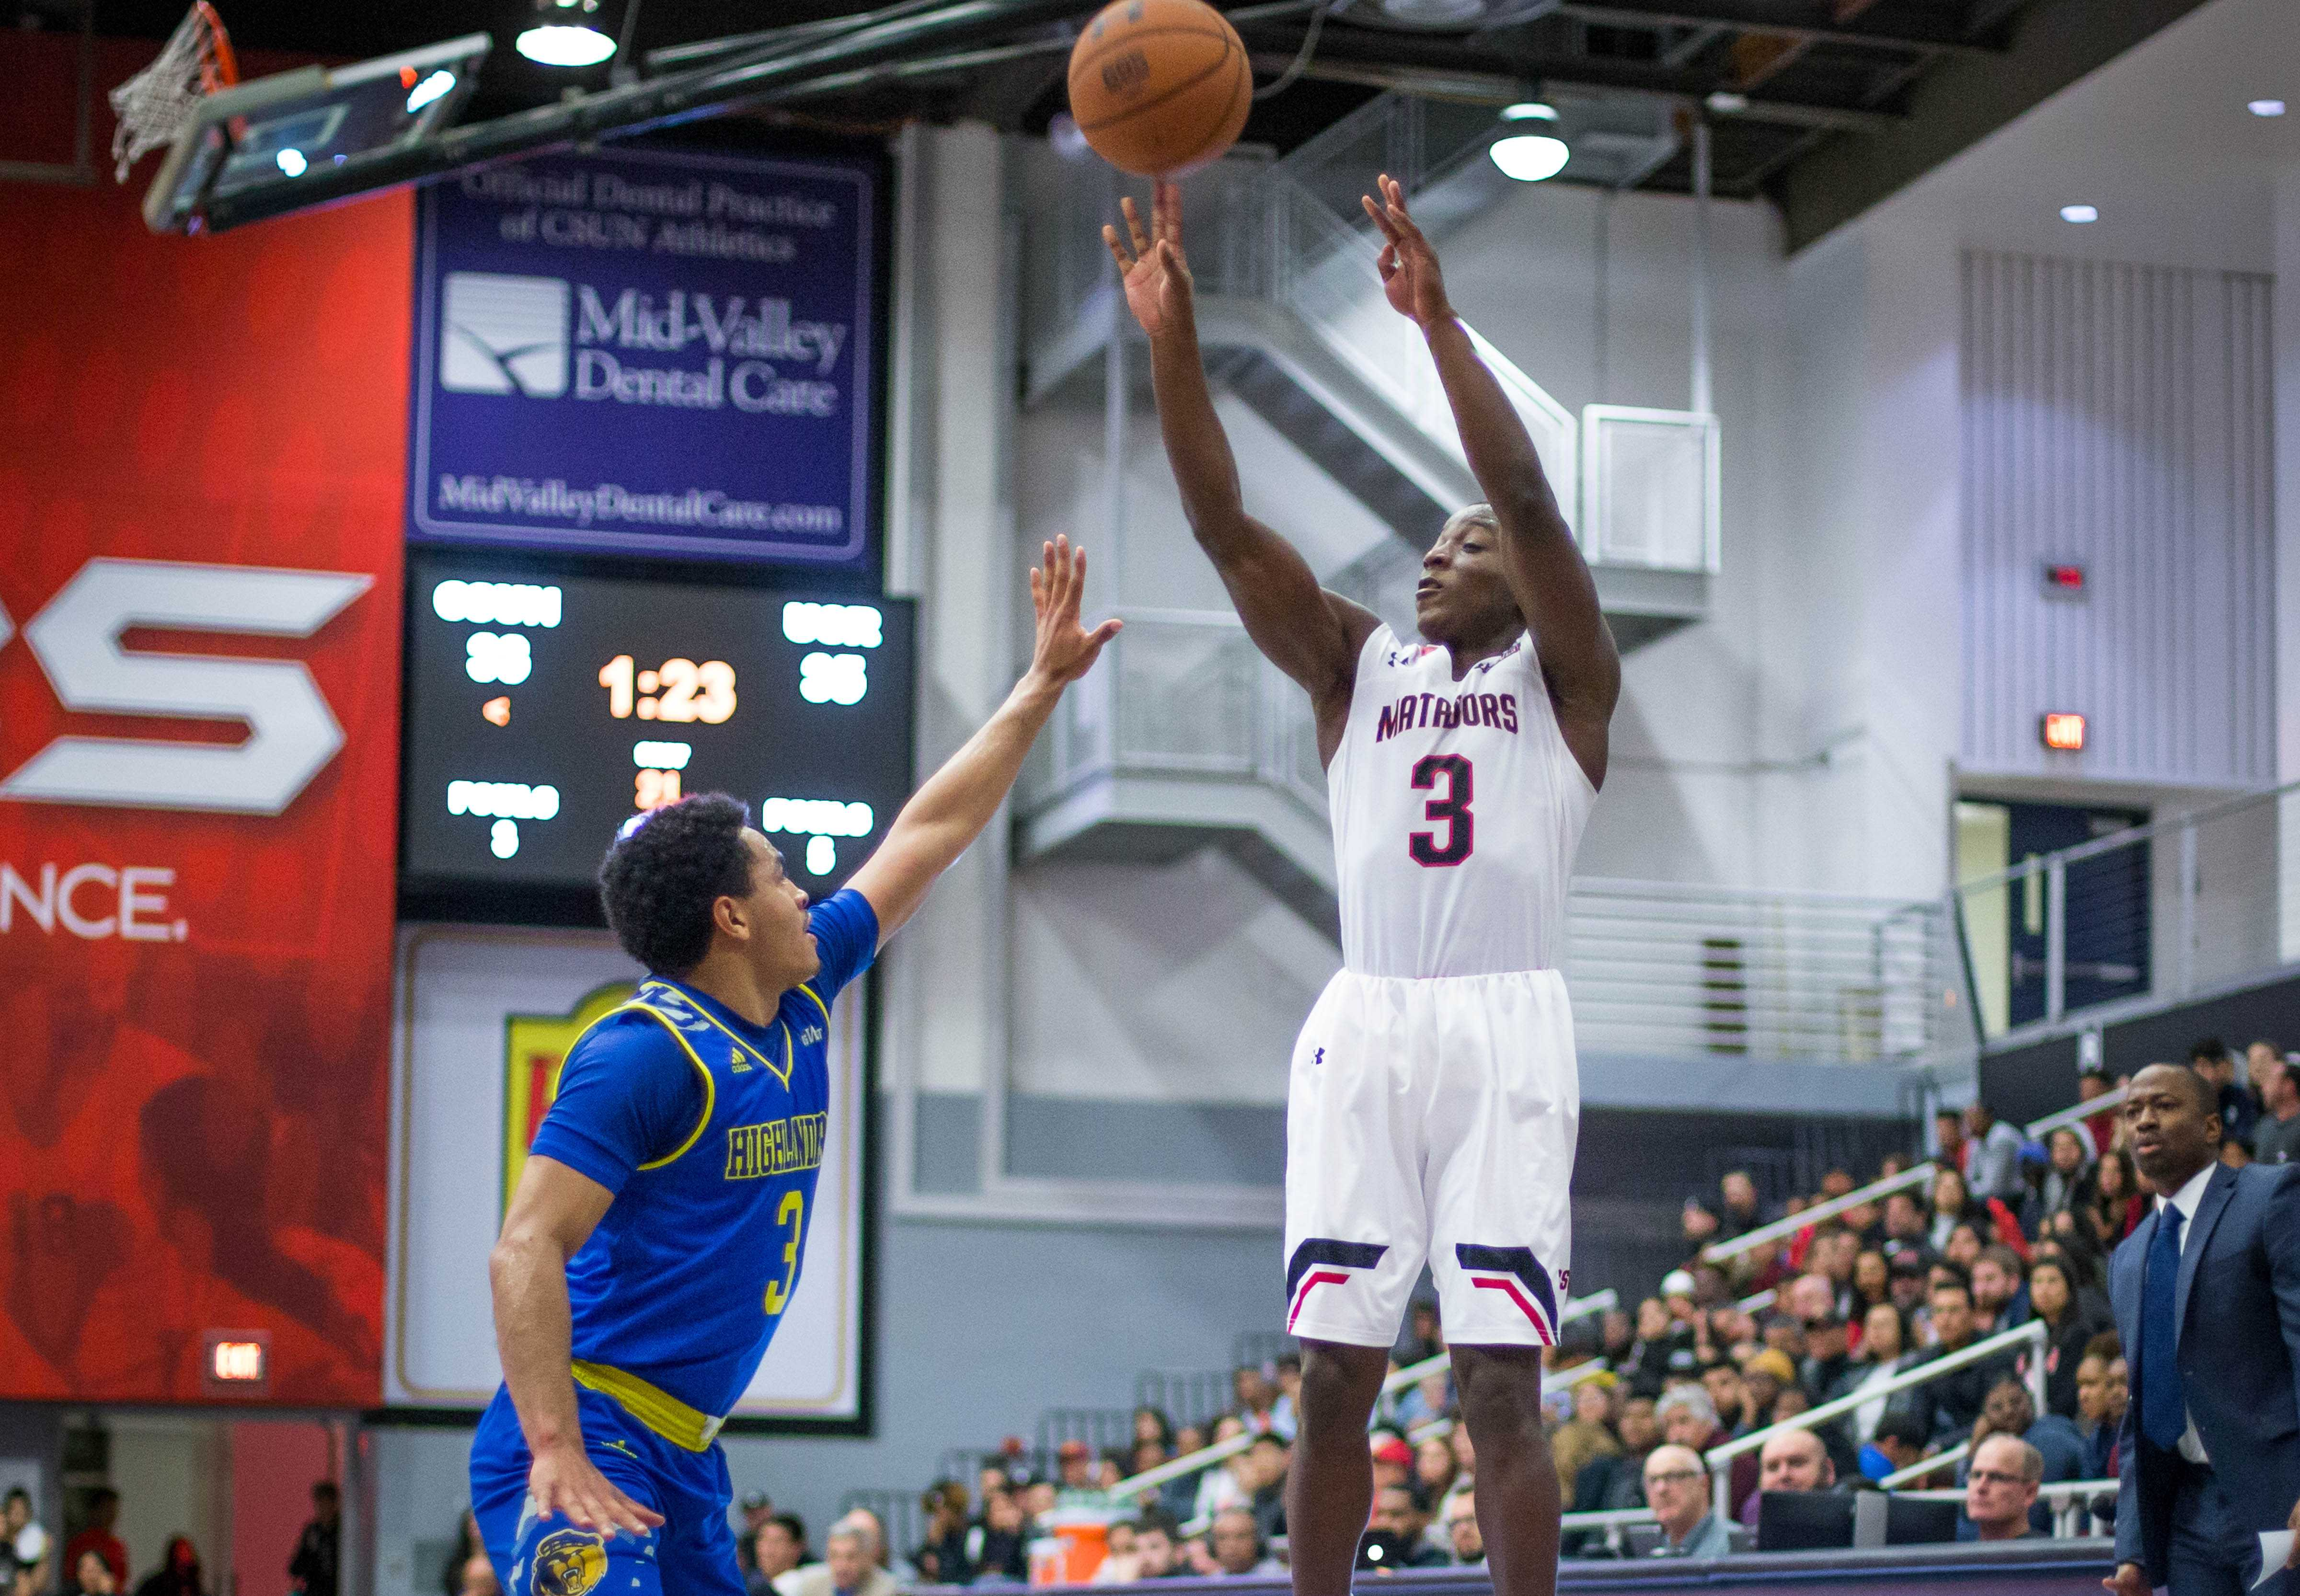 A CSUN Men's Basketball player making jumpshot